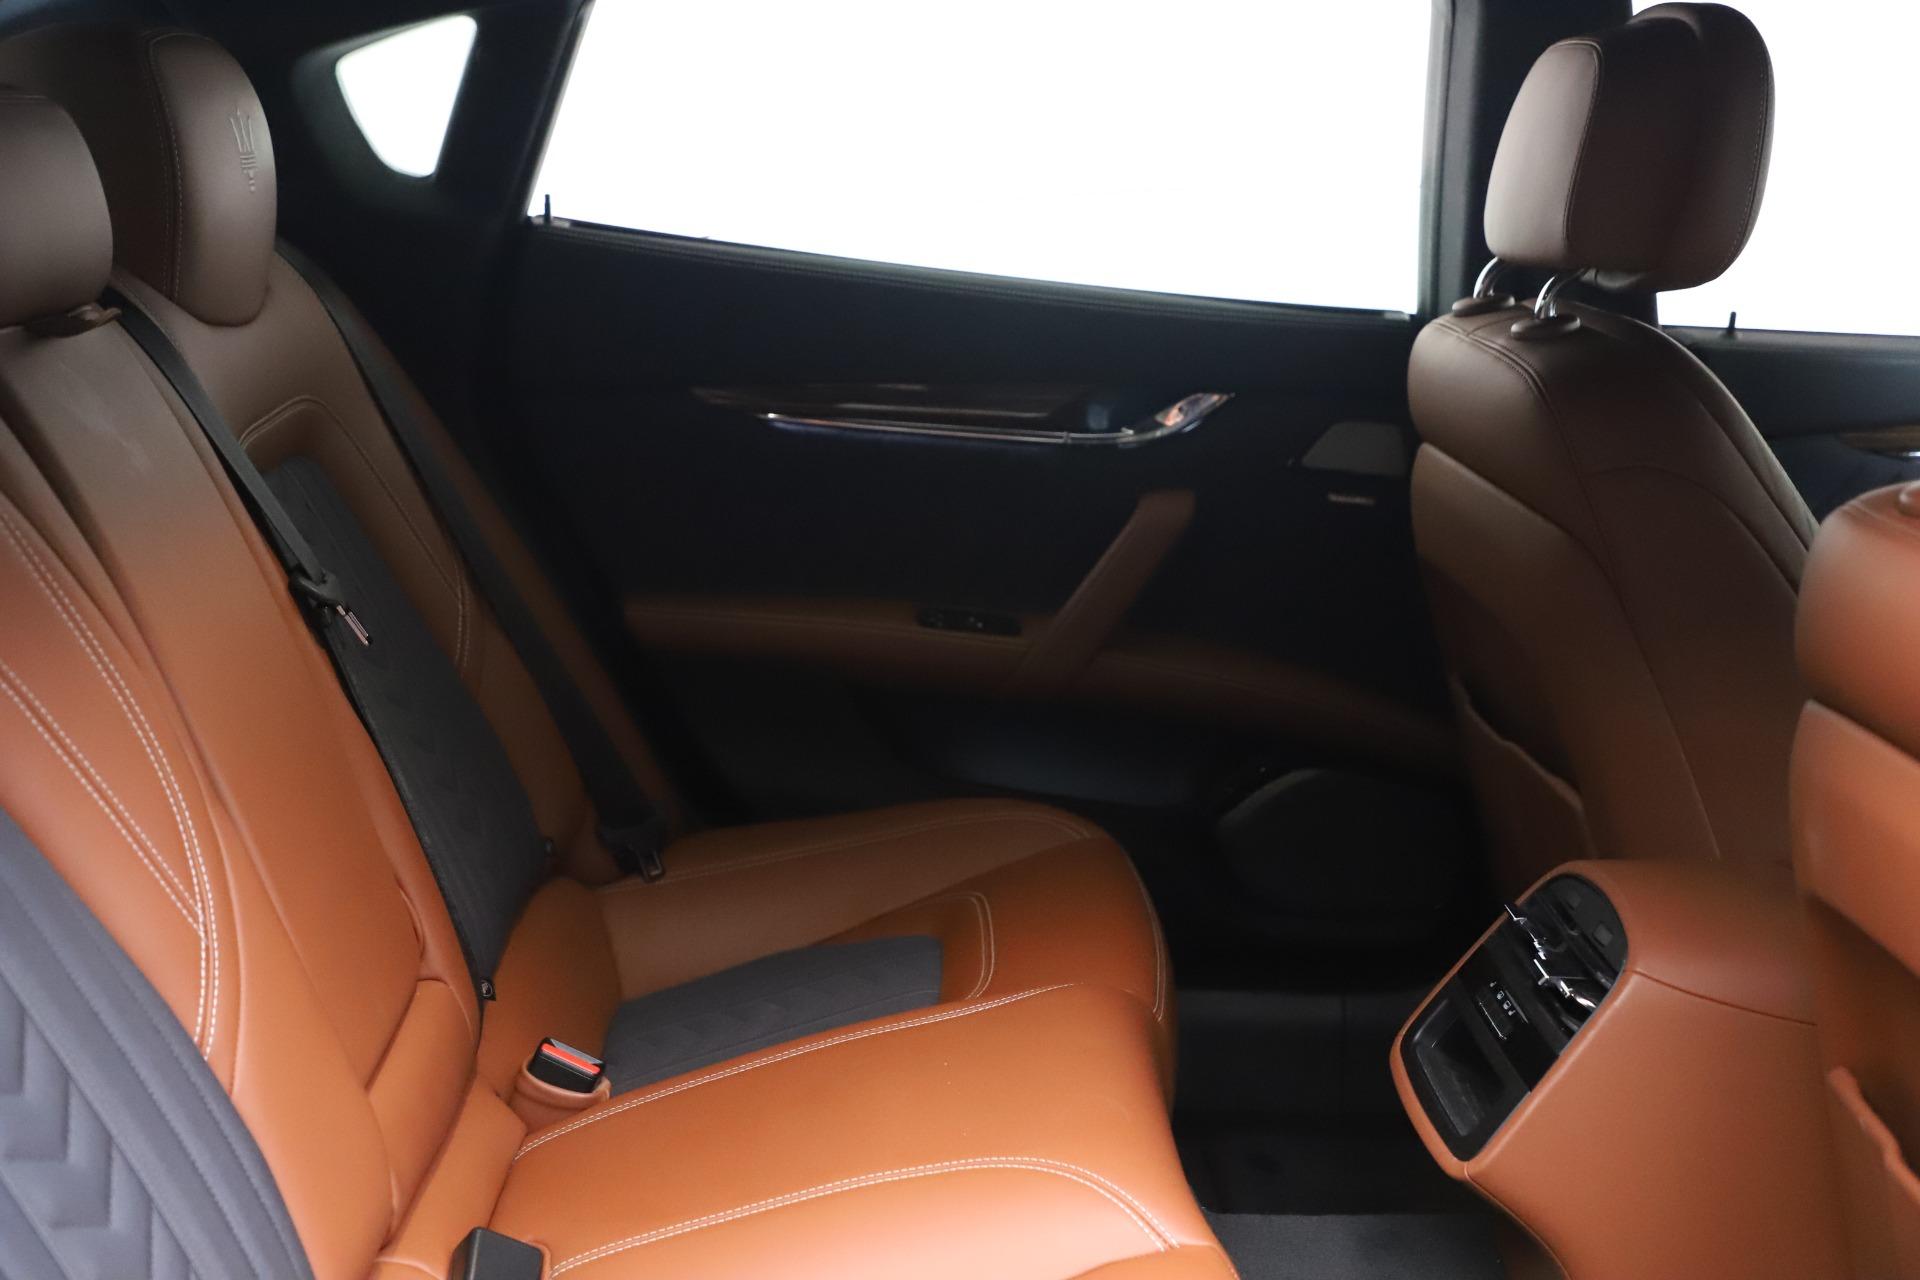 New 2017 Maserati Quattroporte SQ4 GranLusso/ Zegna For Sale In Westport, CT 1355_p23